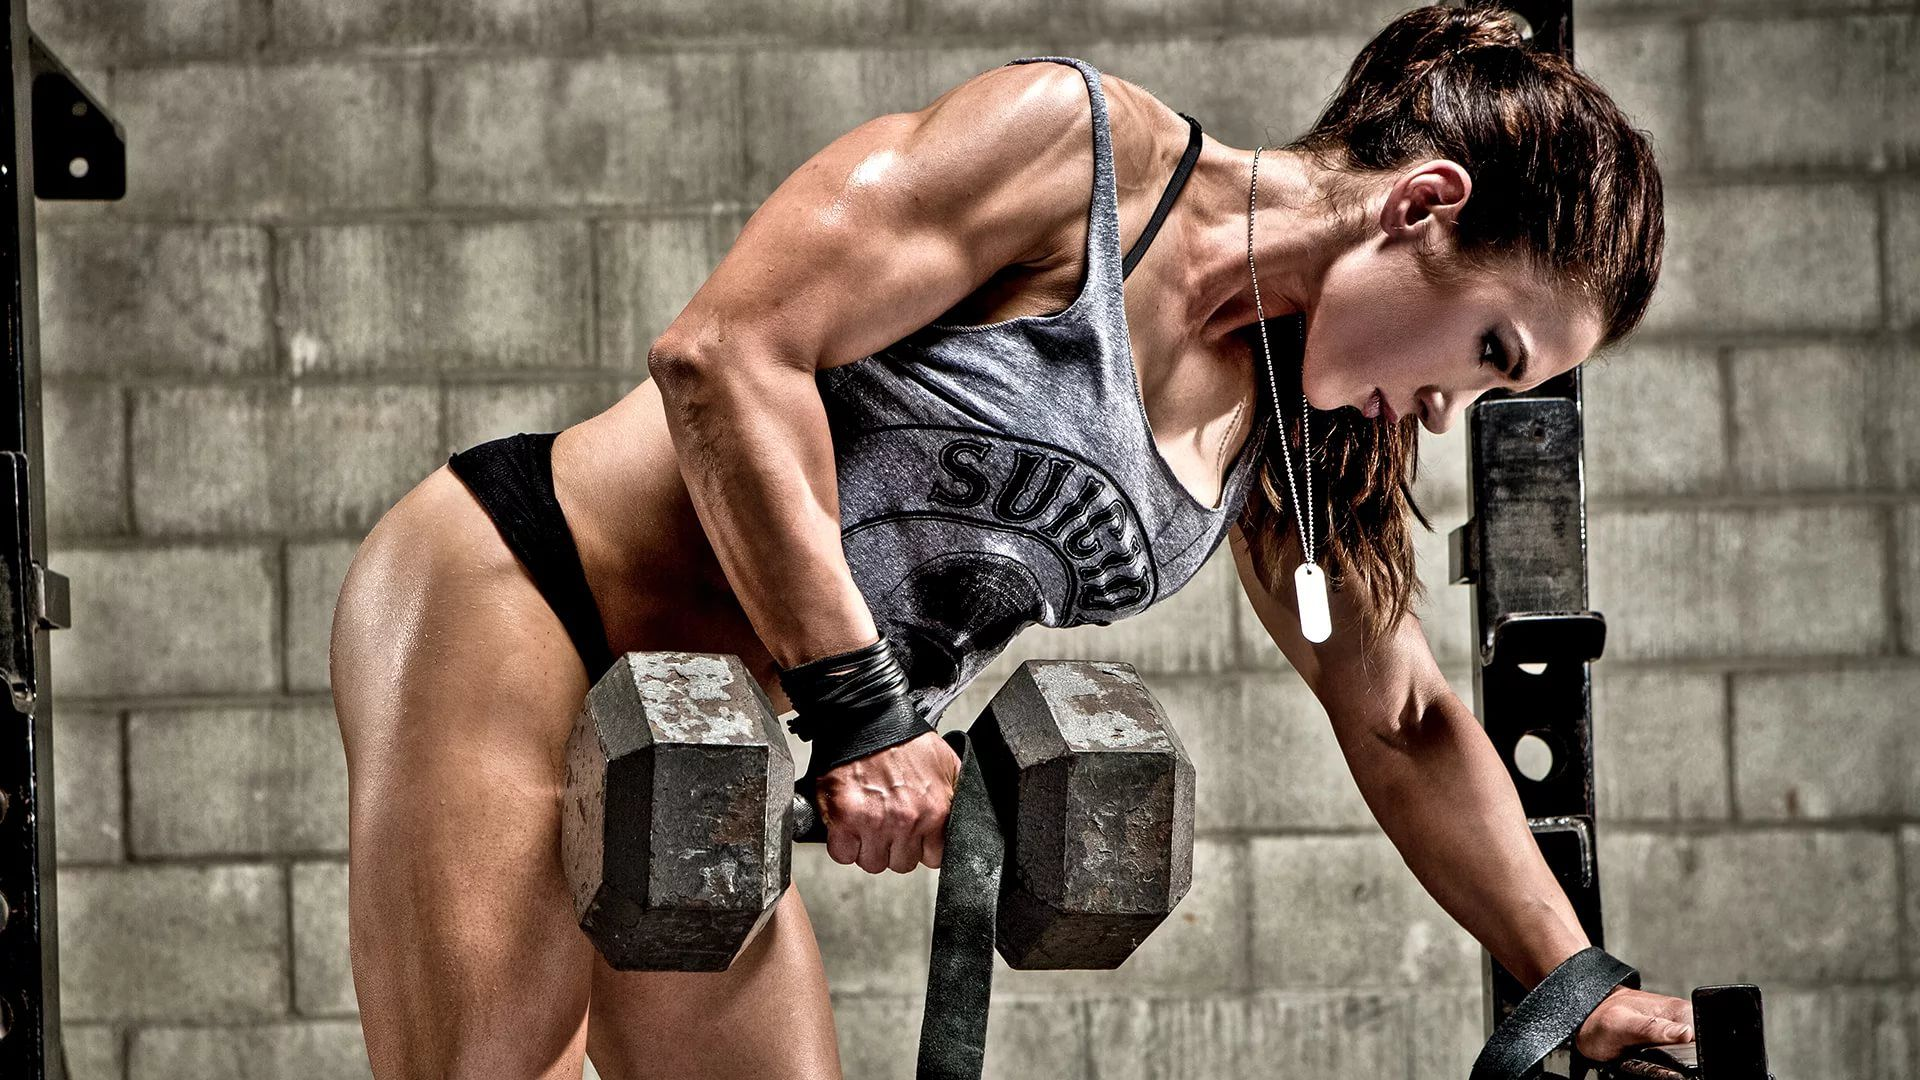 Workout download free wallpaper image search